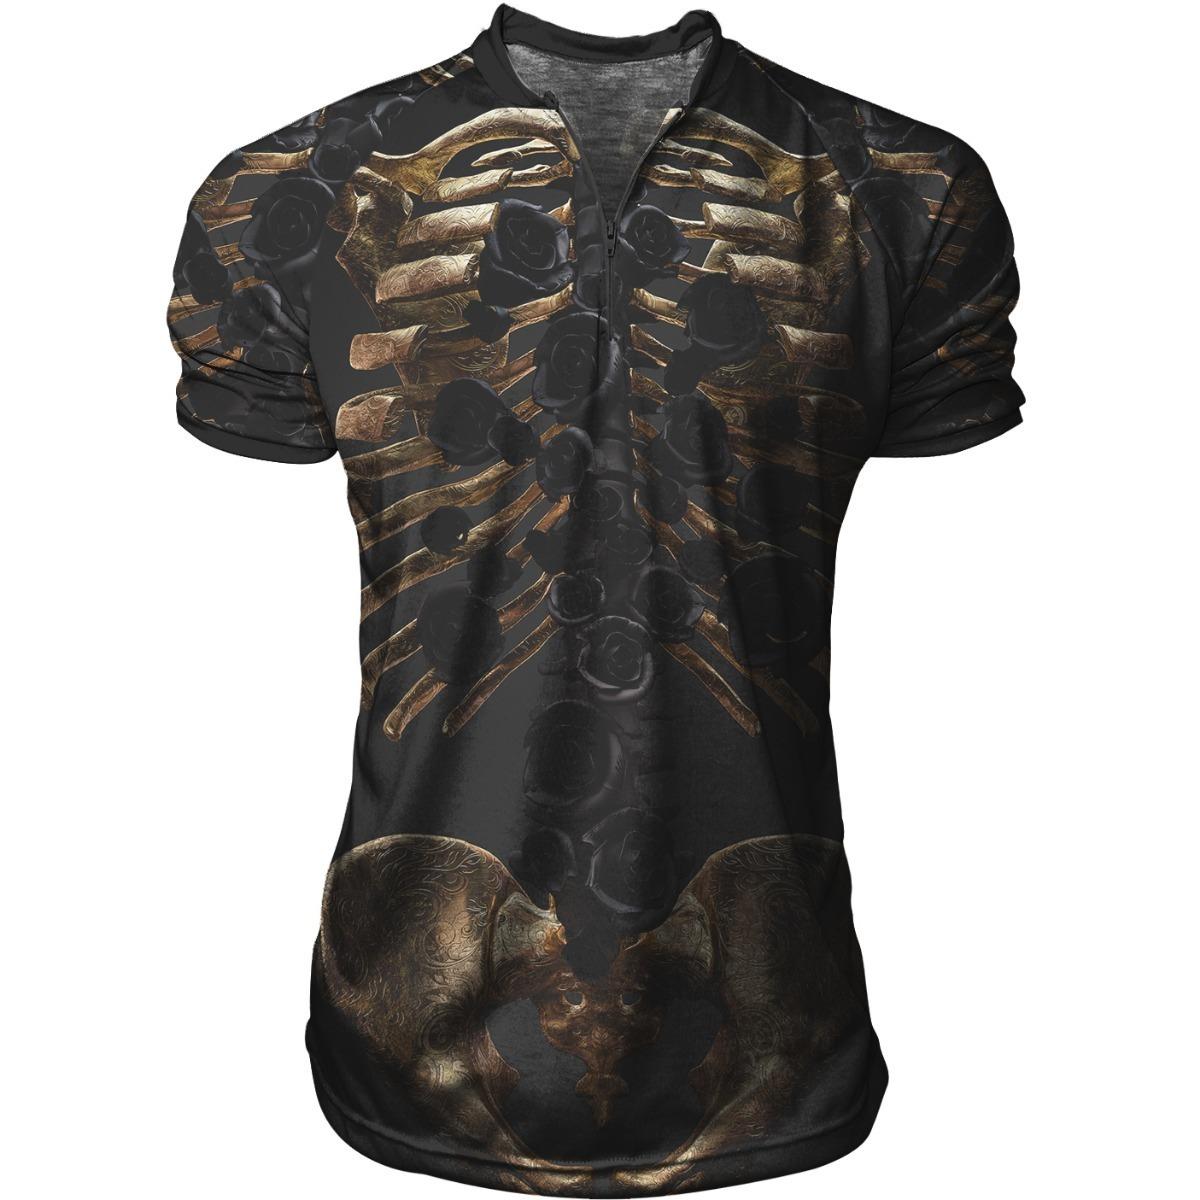 a5fb0bdef8 Camiseta Camisa Polo Sport Ziper Skelet Swag B156 - R  56